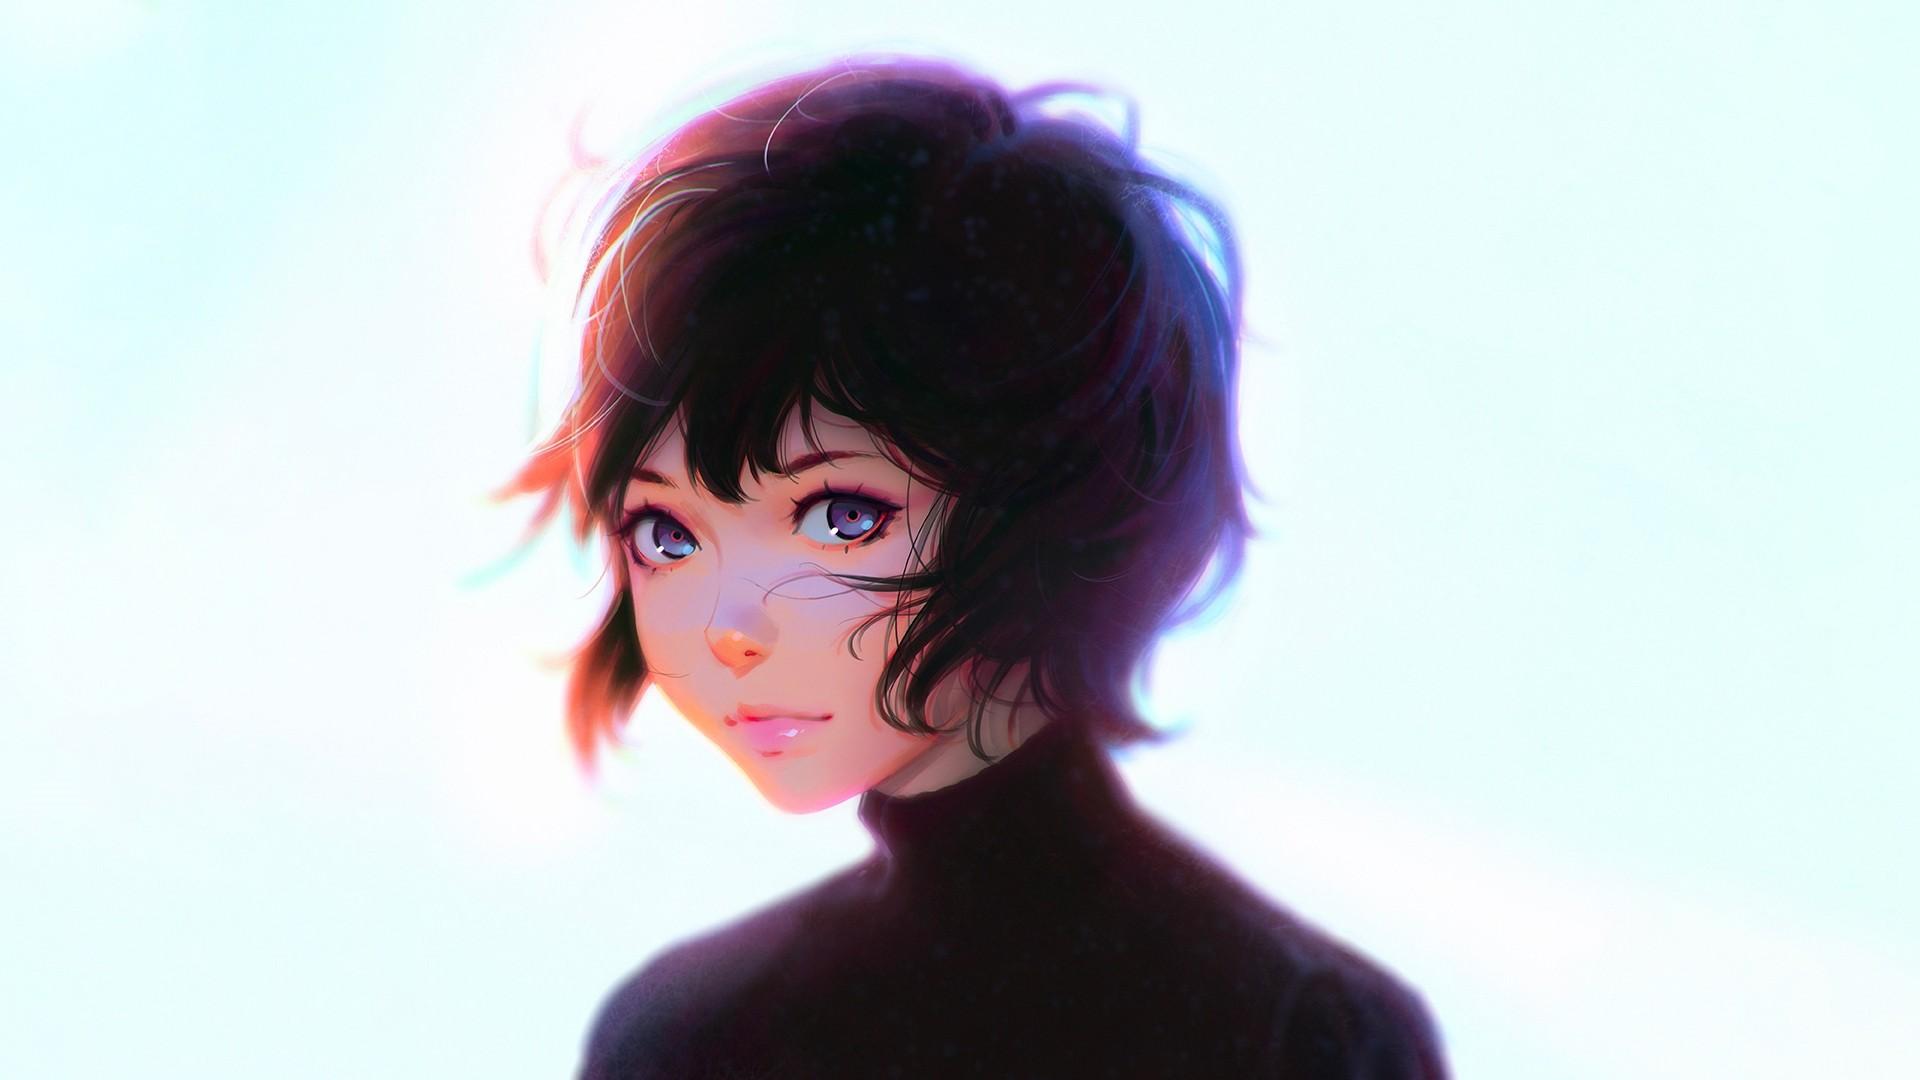 Anime Girl Short Hair Wallpaper Picture hd